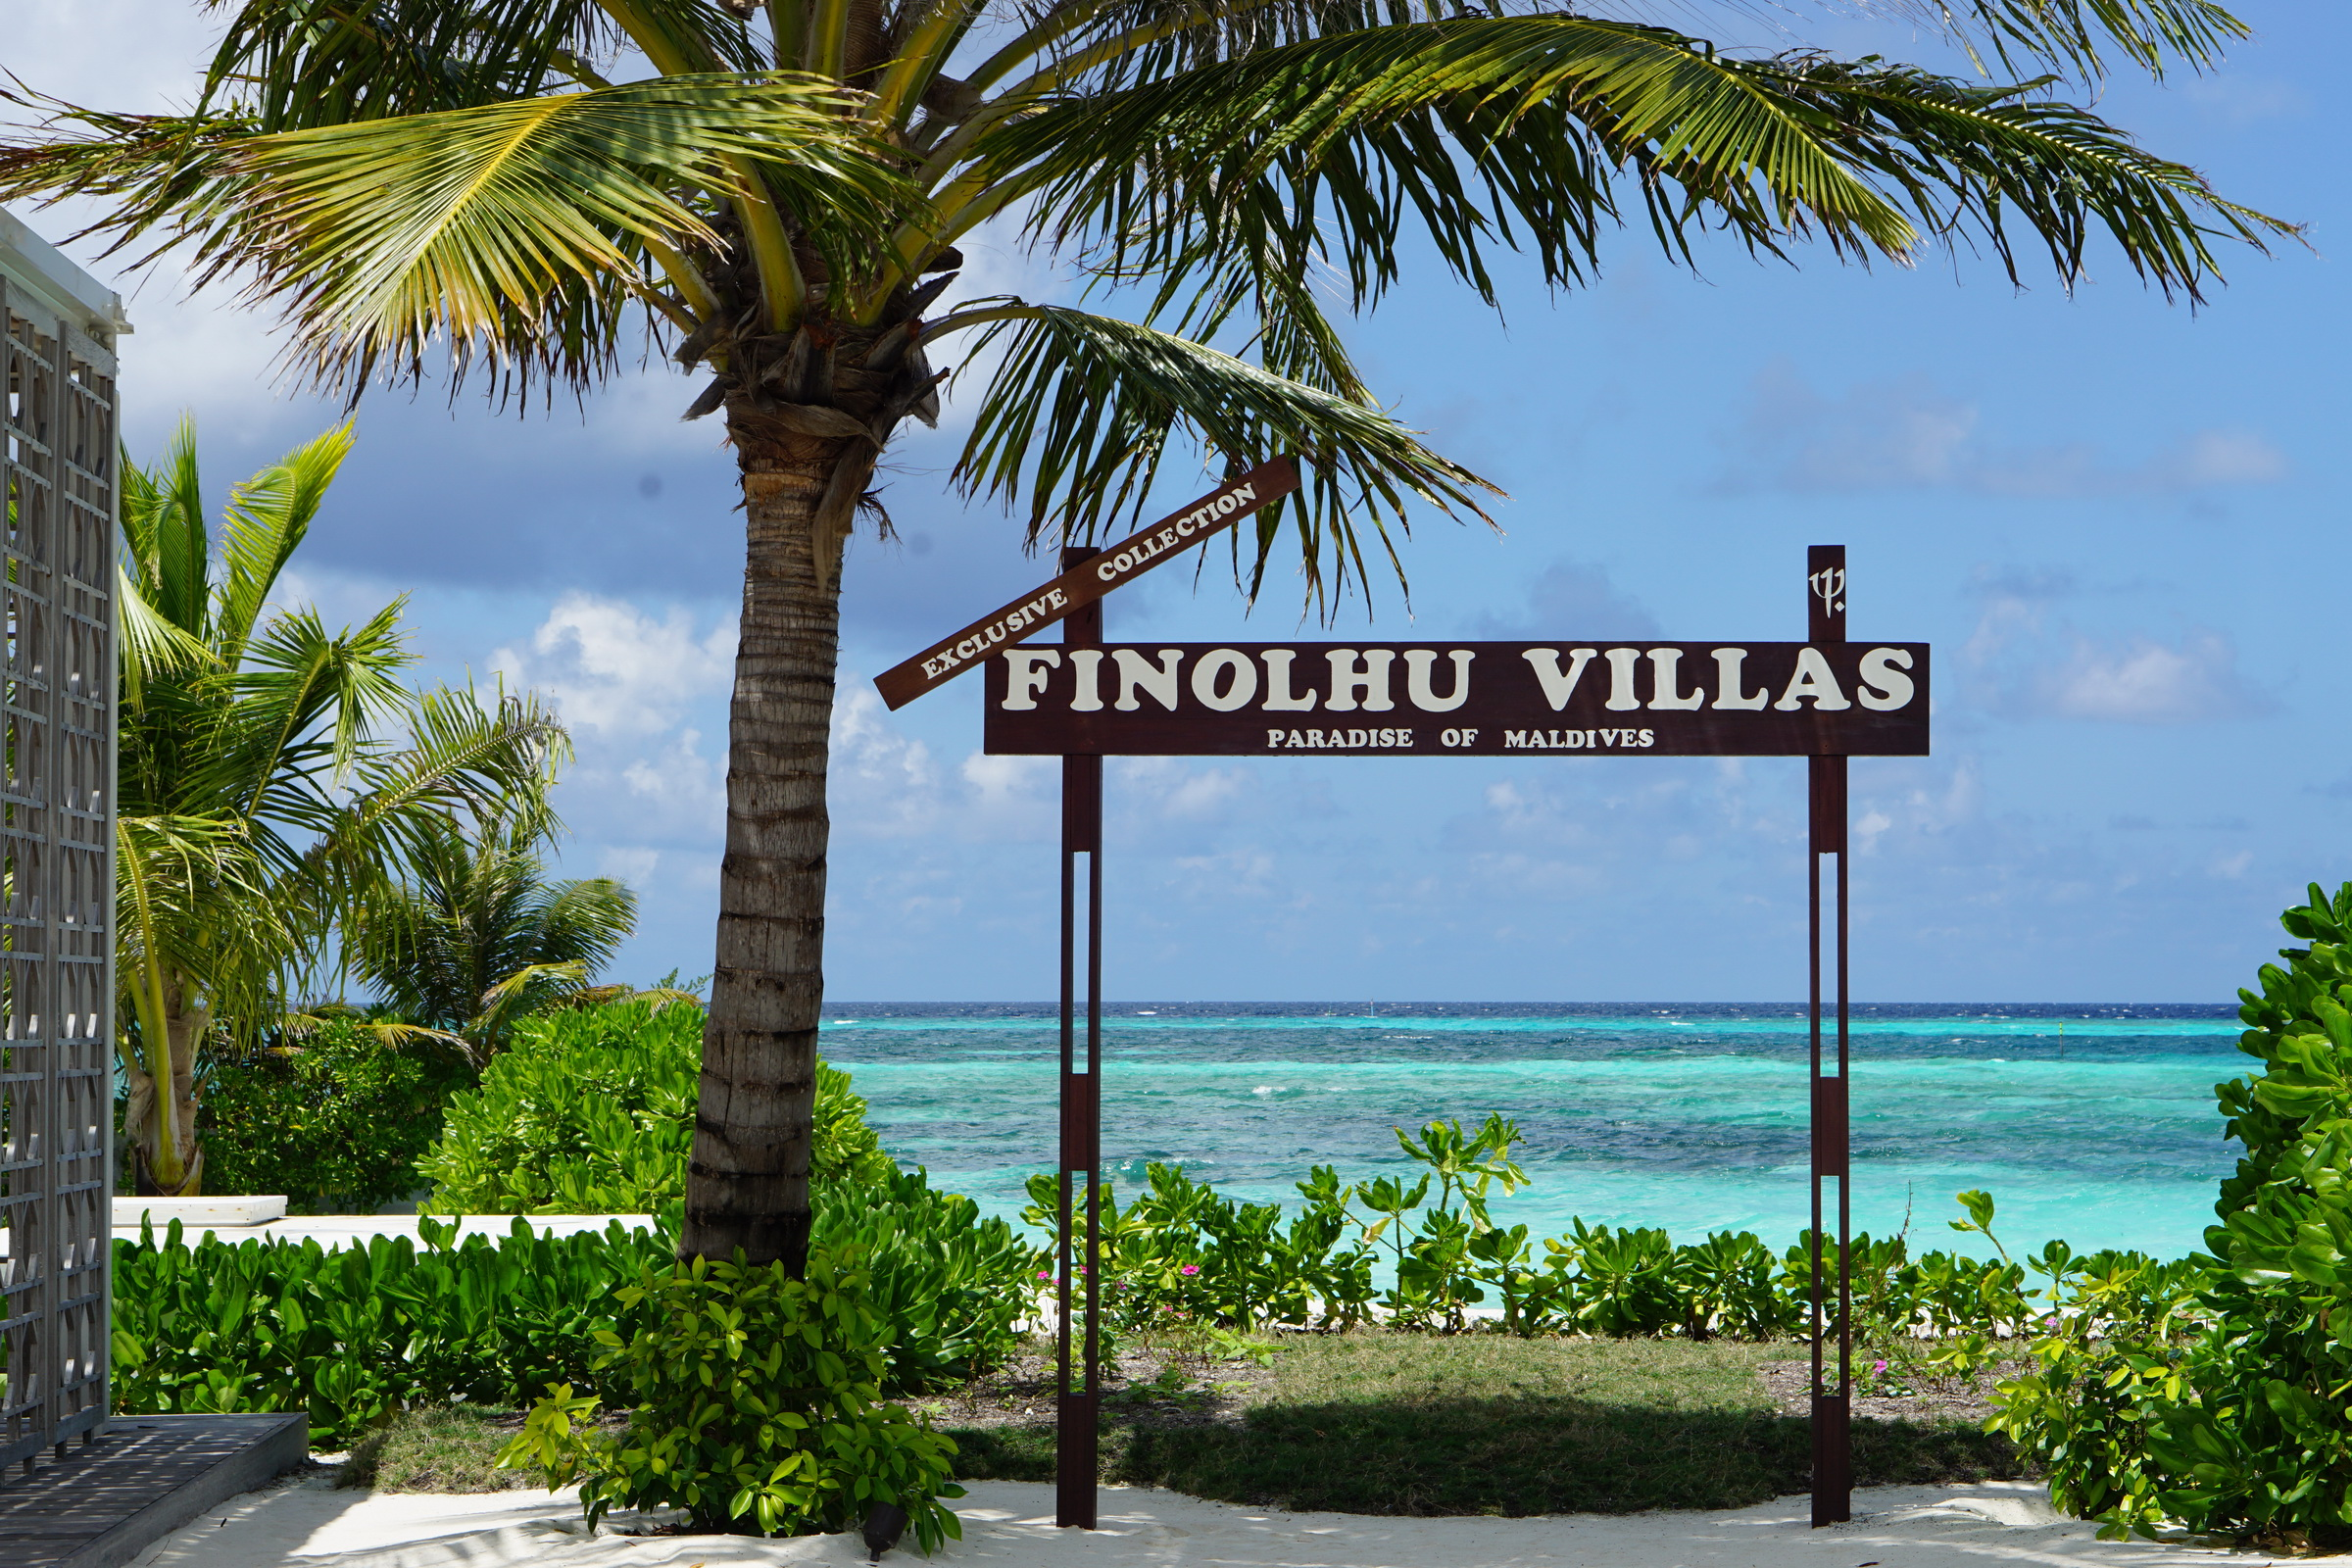 Club Med Finolhu Villas, Maldives 3วัน 2 คืน บินBangkok Airways